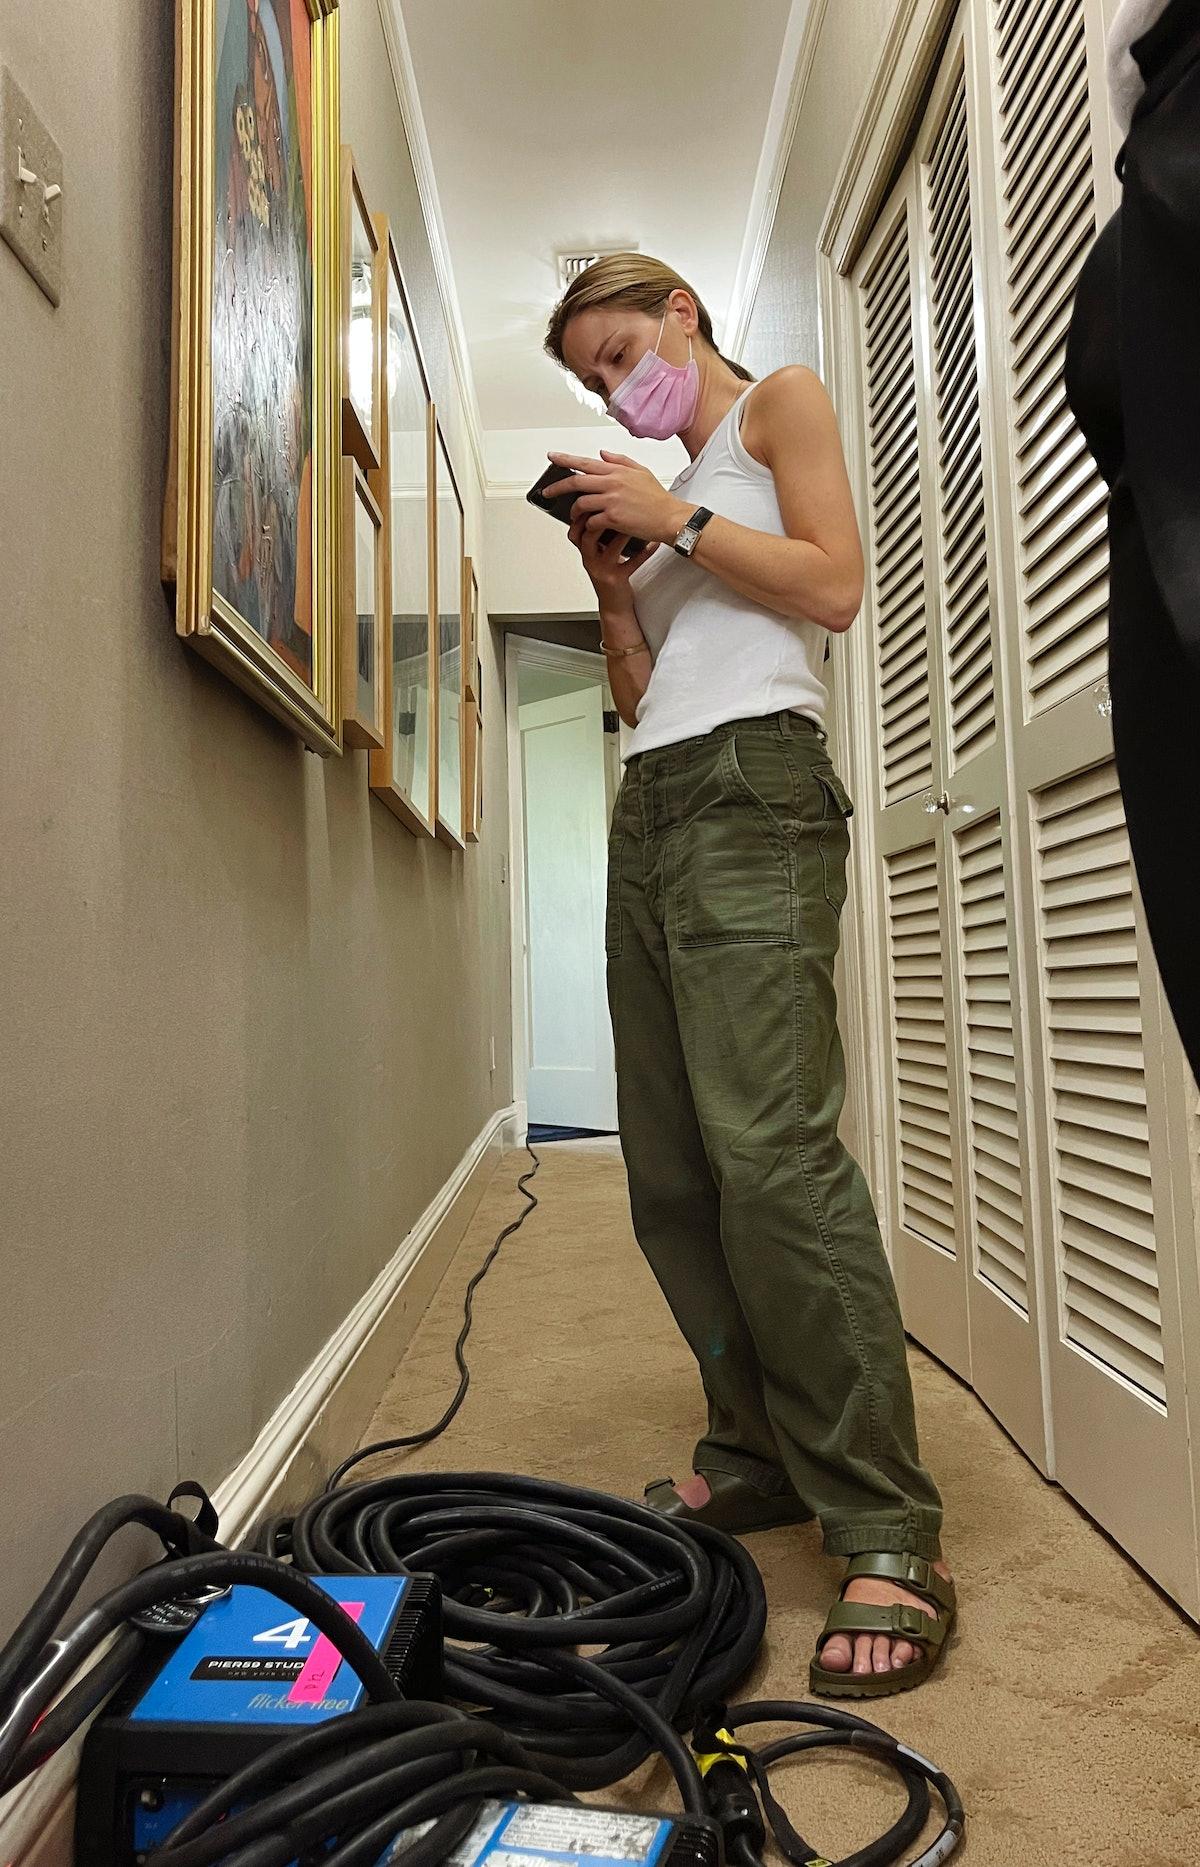 Fashion Director Nora Milch on the Julia Garner shoot.